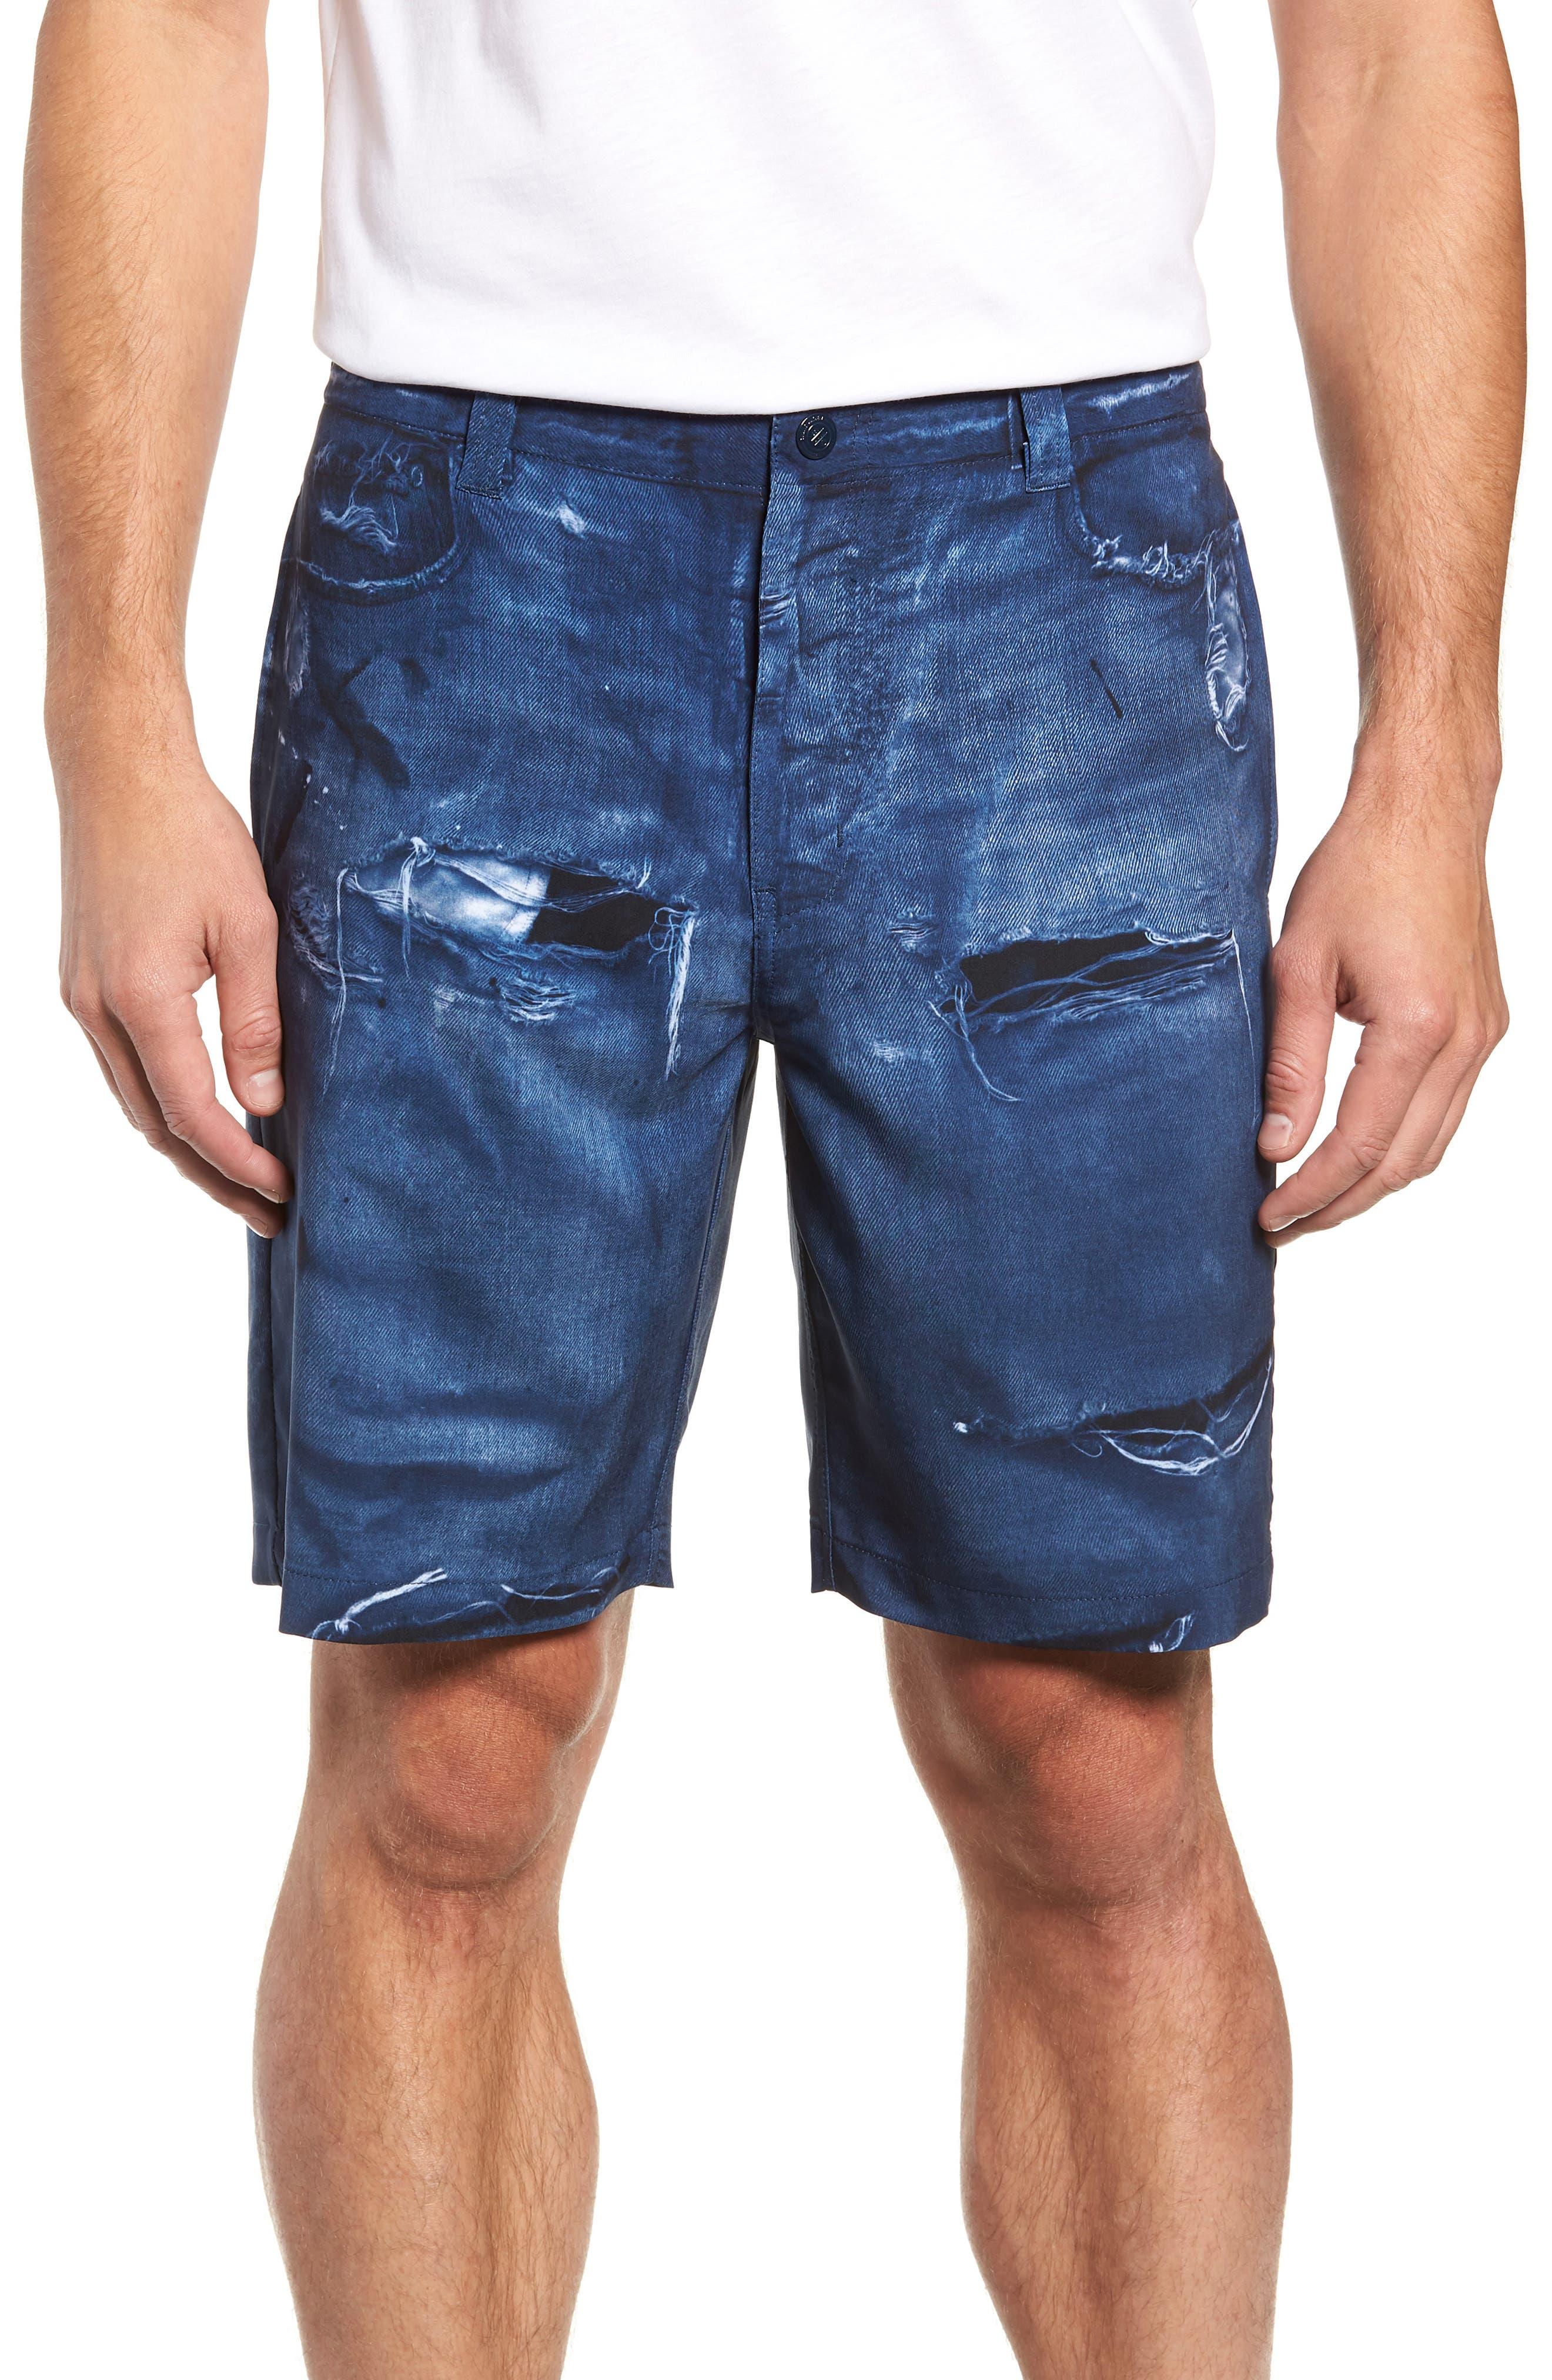 Man o' War Regular Fit Shorts,                             Main thumbnail 1, color,                             DENIM